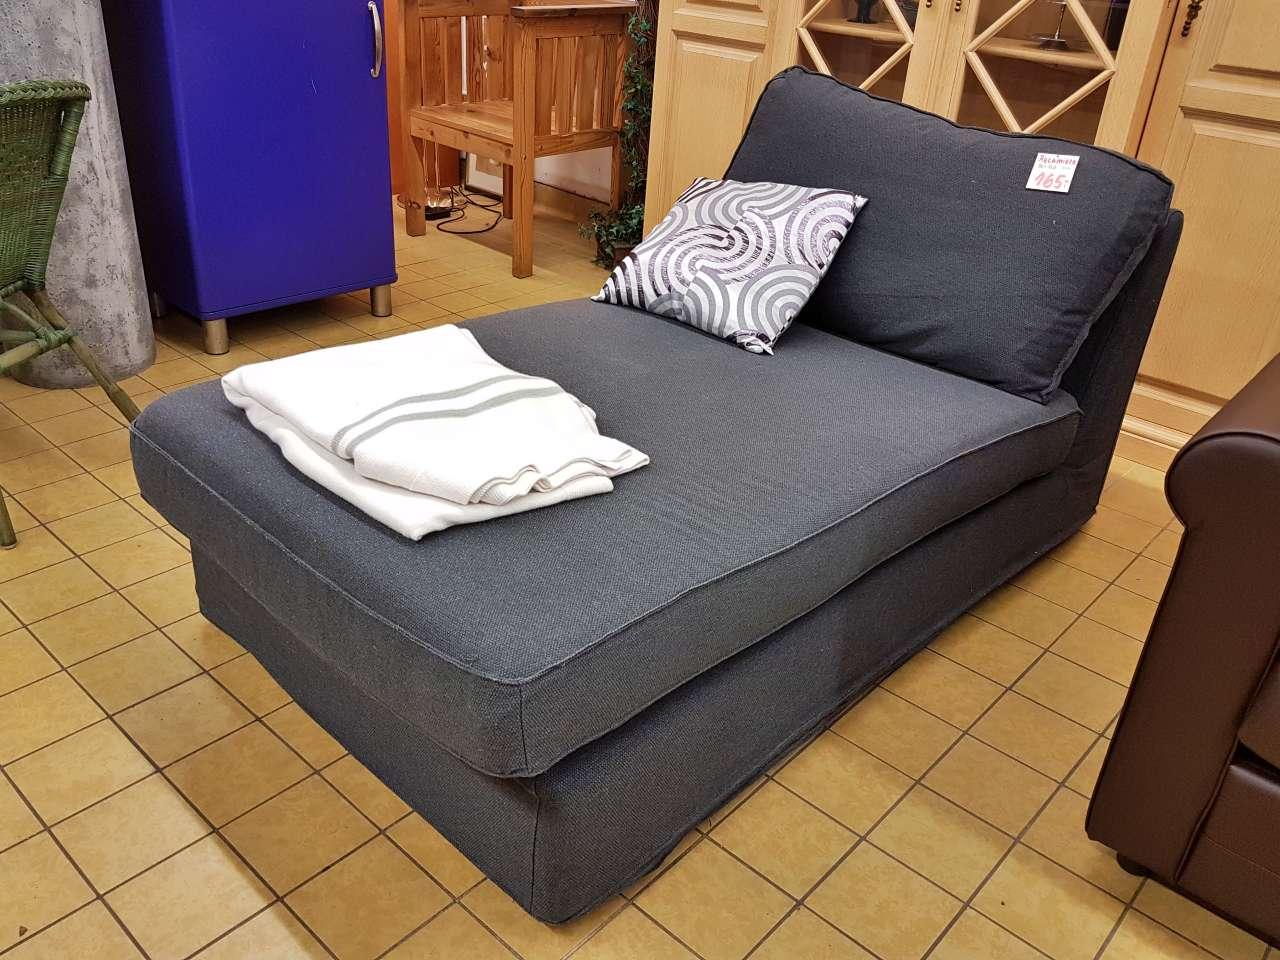 Liege Schlafsofa IKEA Kivik grau Stoff